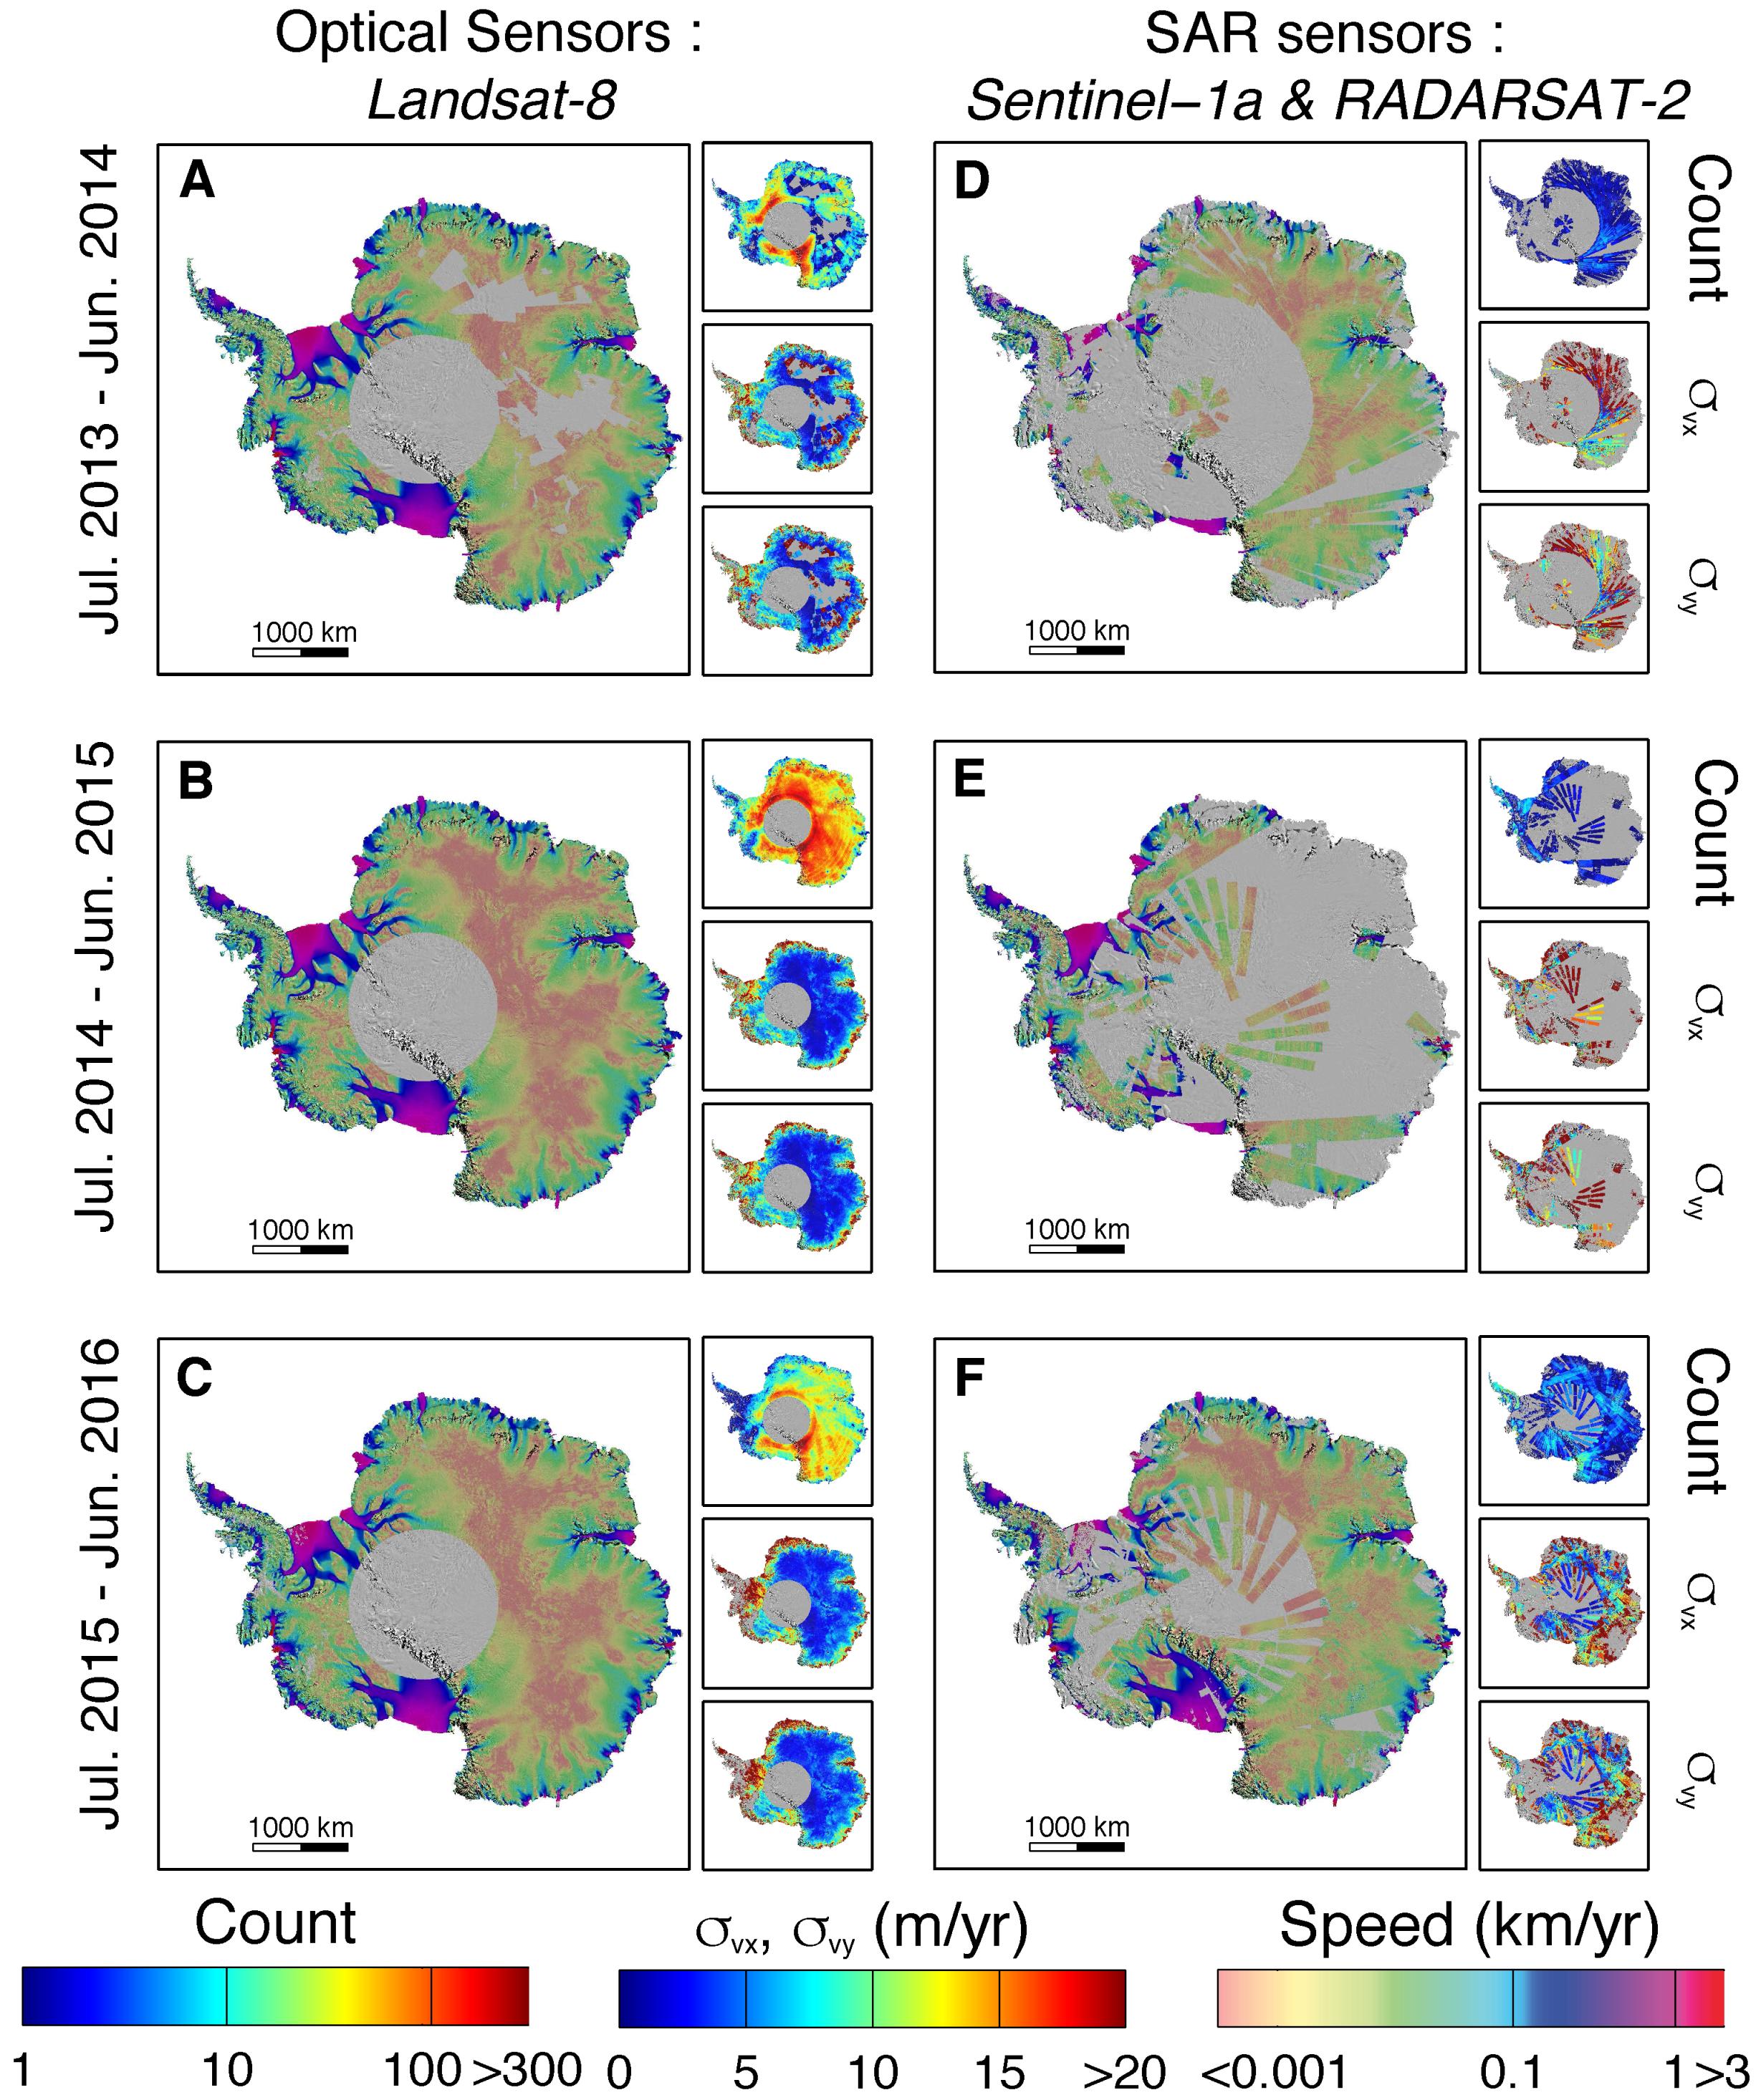 remote sensing full text comprehensive annual ice sheet remote sensing full text comprehensive annual ice sheet velocity mapping using landsat 8 sentinel 1 and radarsat 2 data html